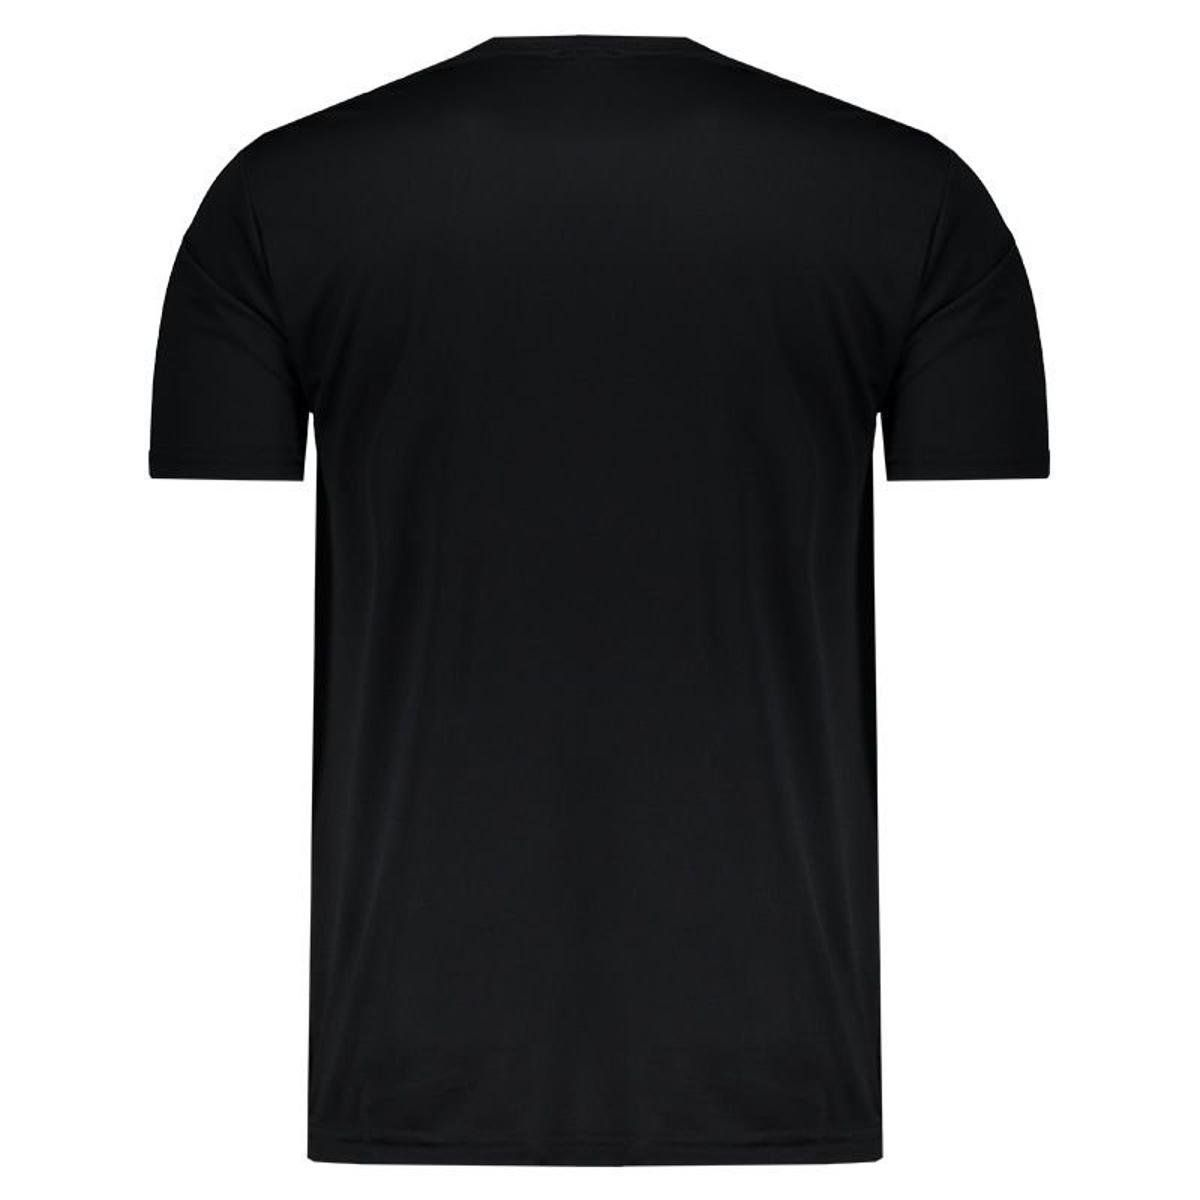 Camisa Vitória Treino Comissão - Kappa - 2019 - Masculina - Preto